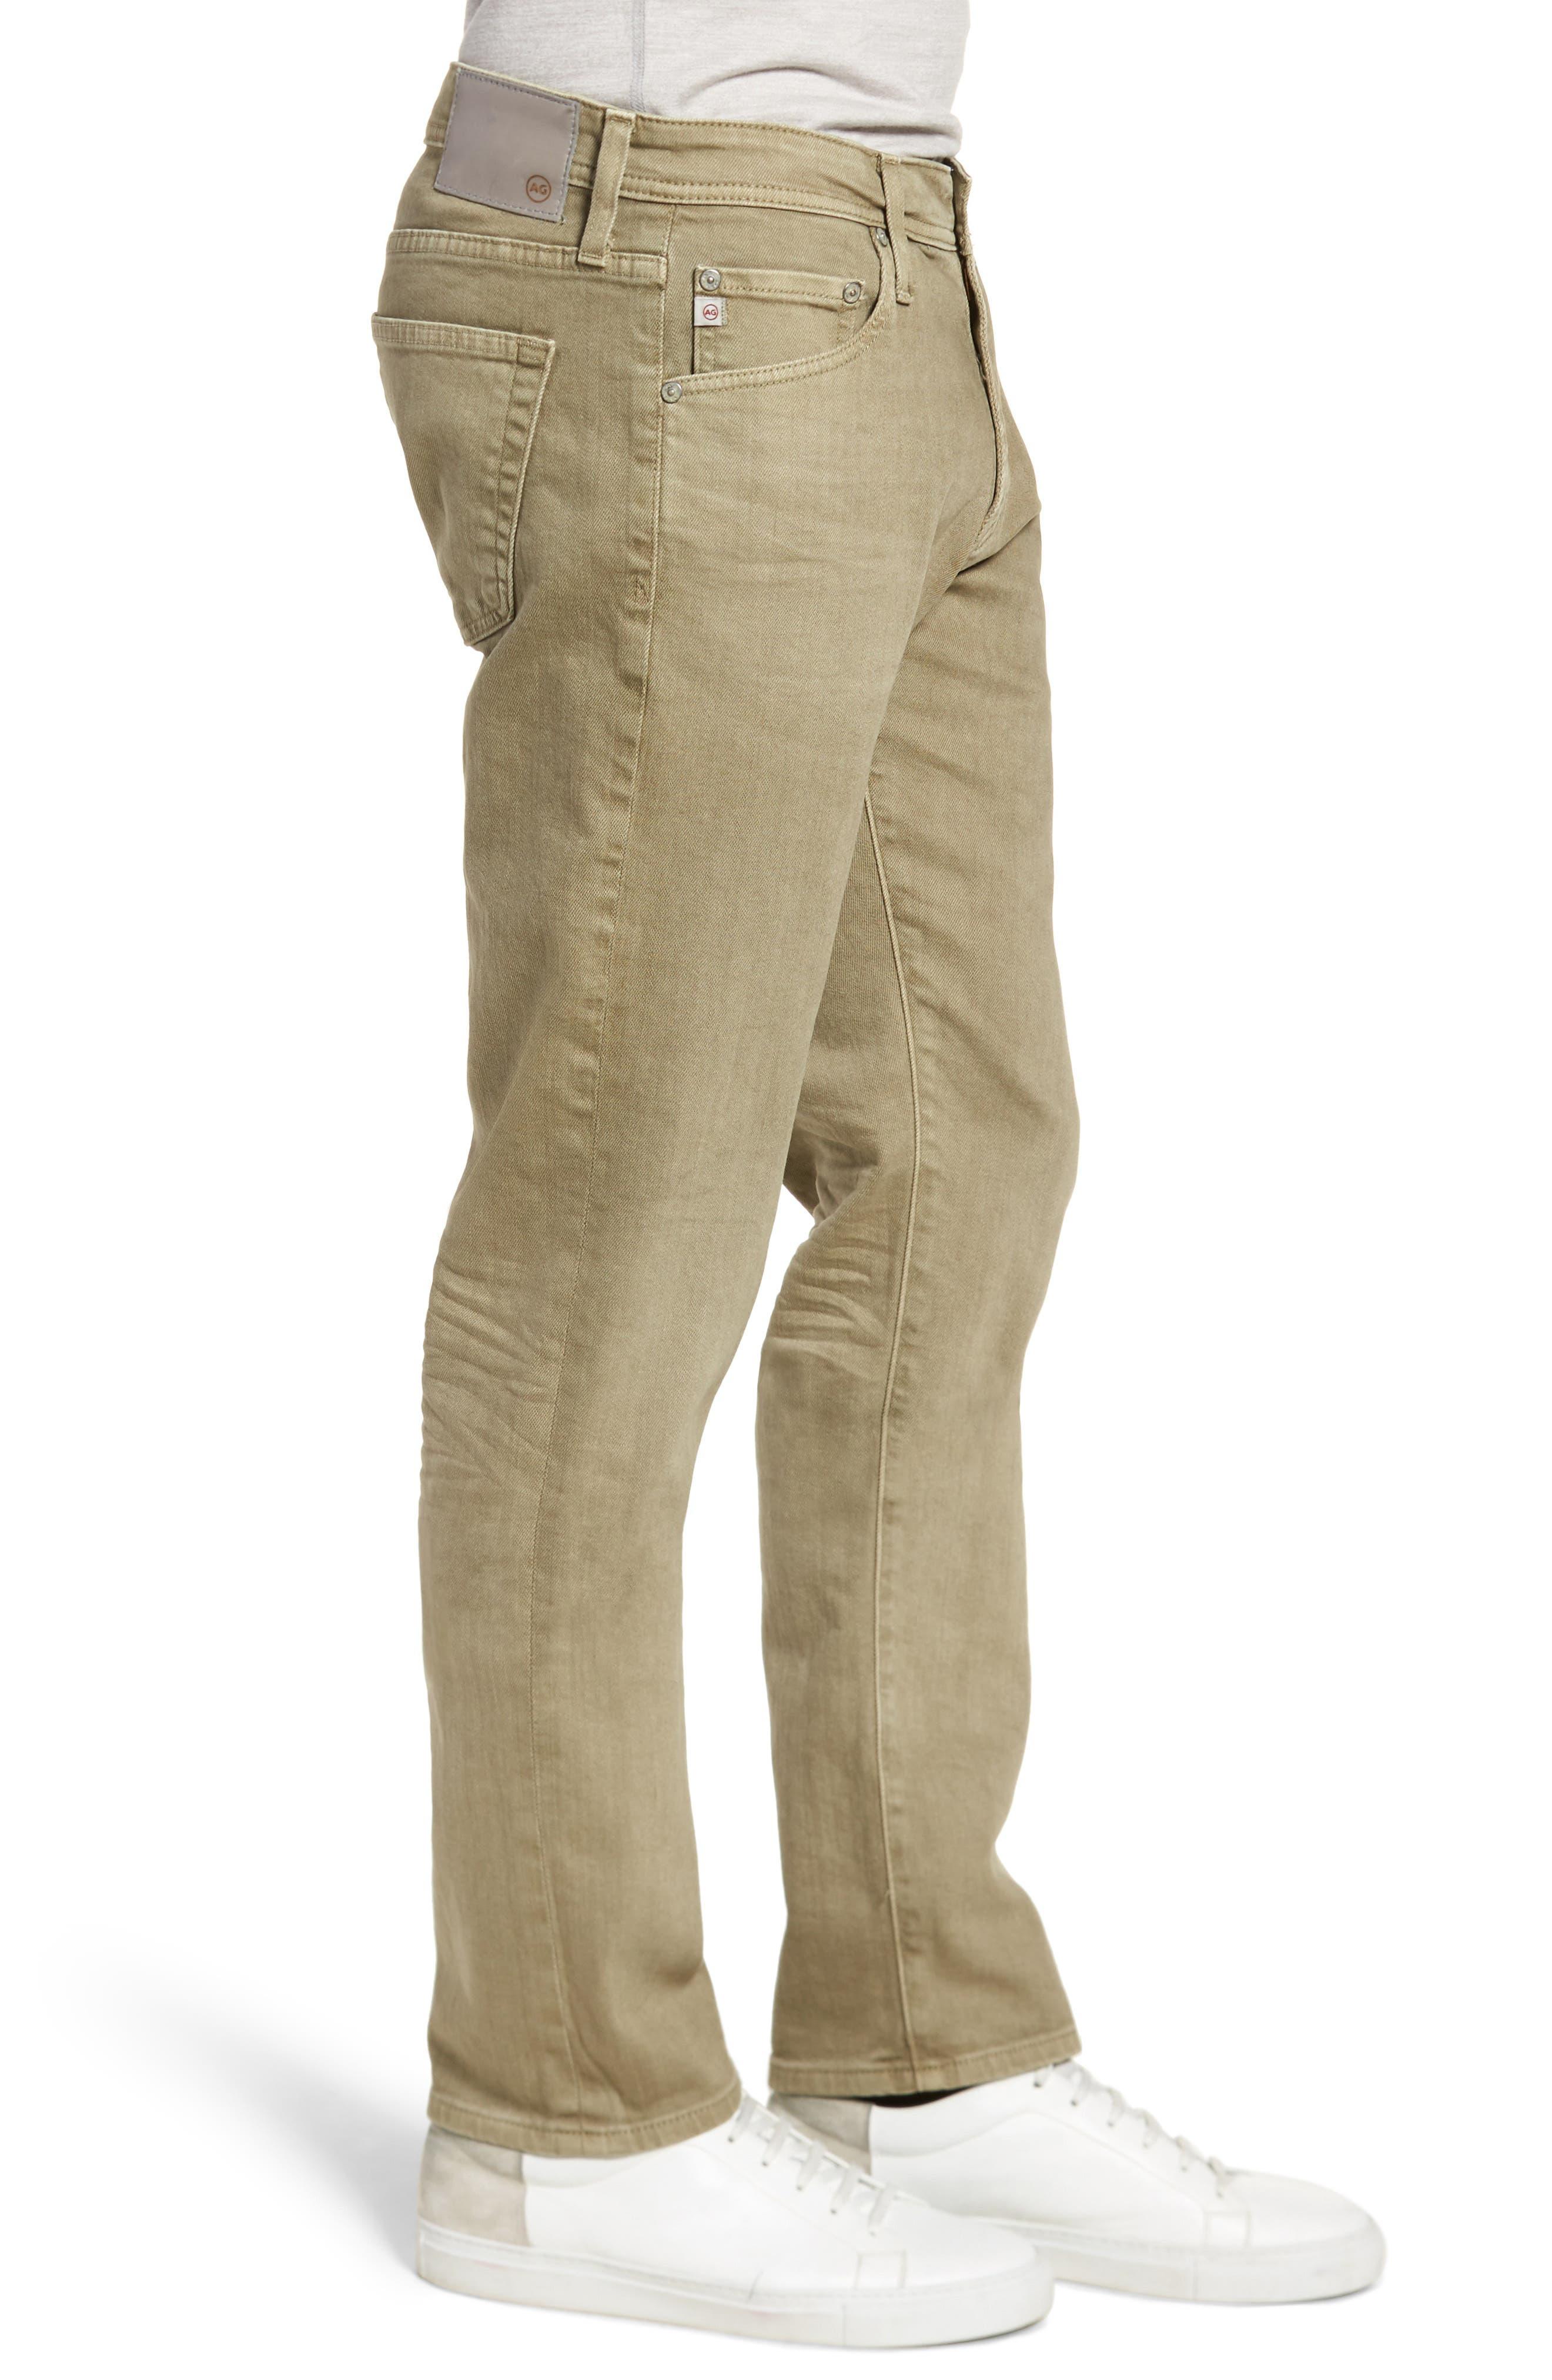 Tellis Slim Fit Jeans,                             Alternate thumbnail 3, color,                             7 Years Dry Cypress